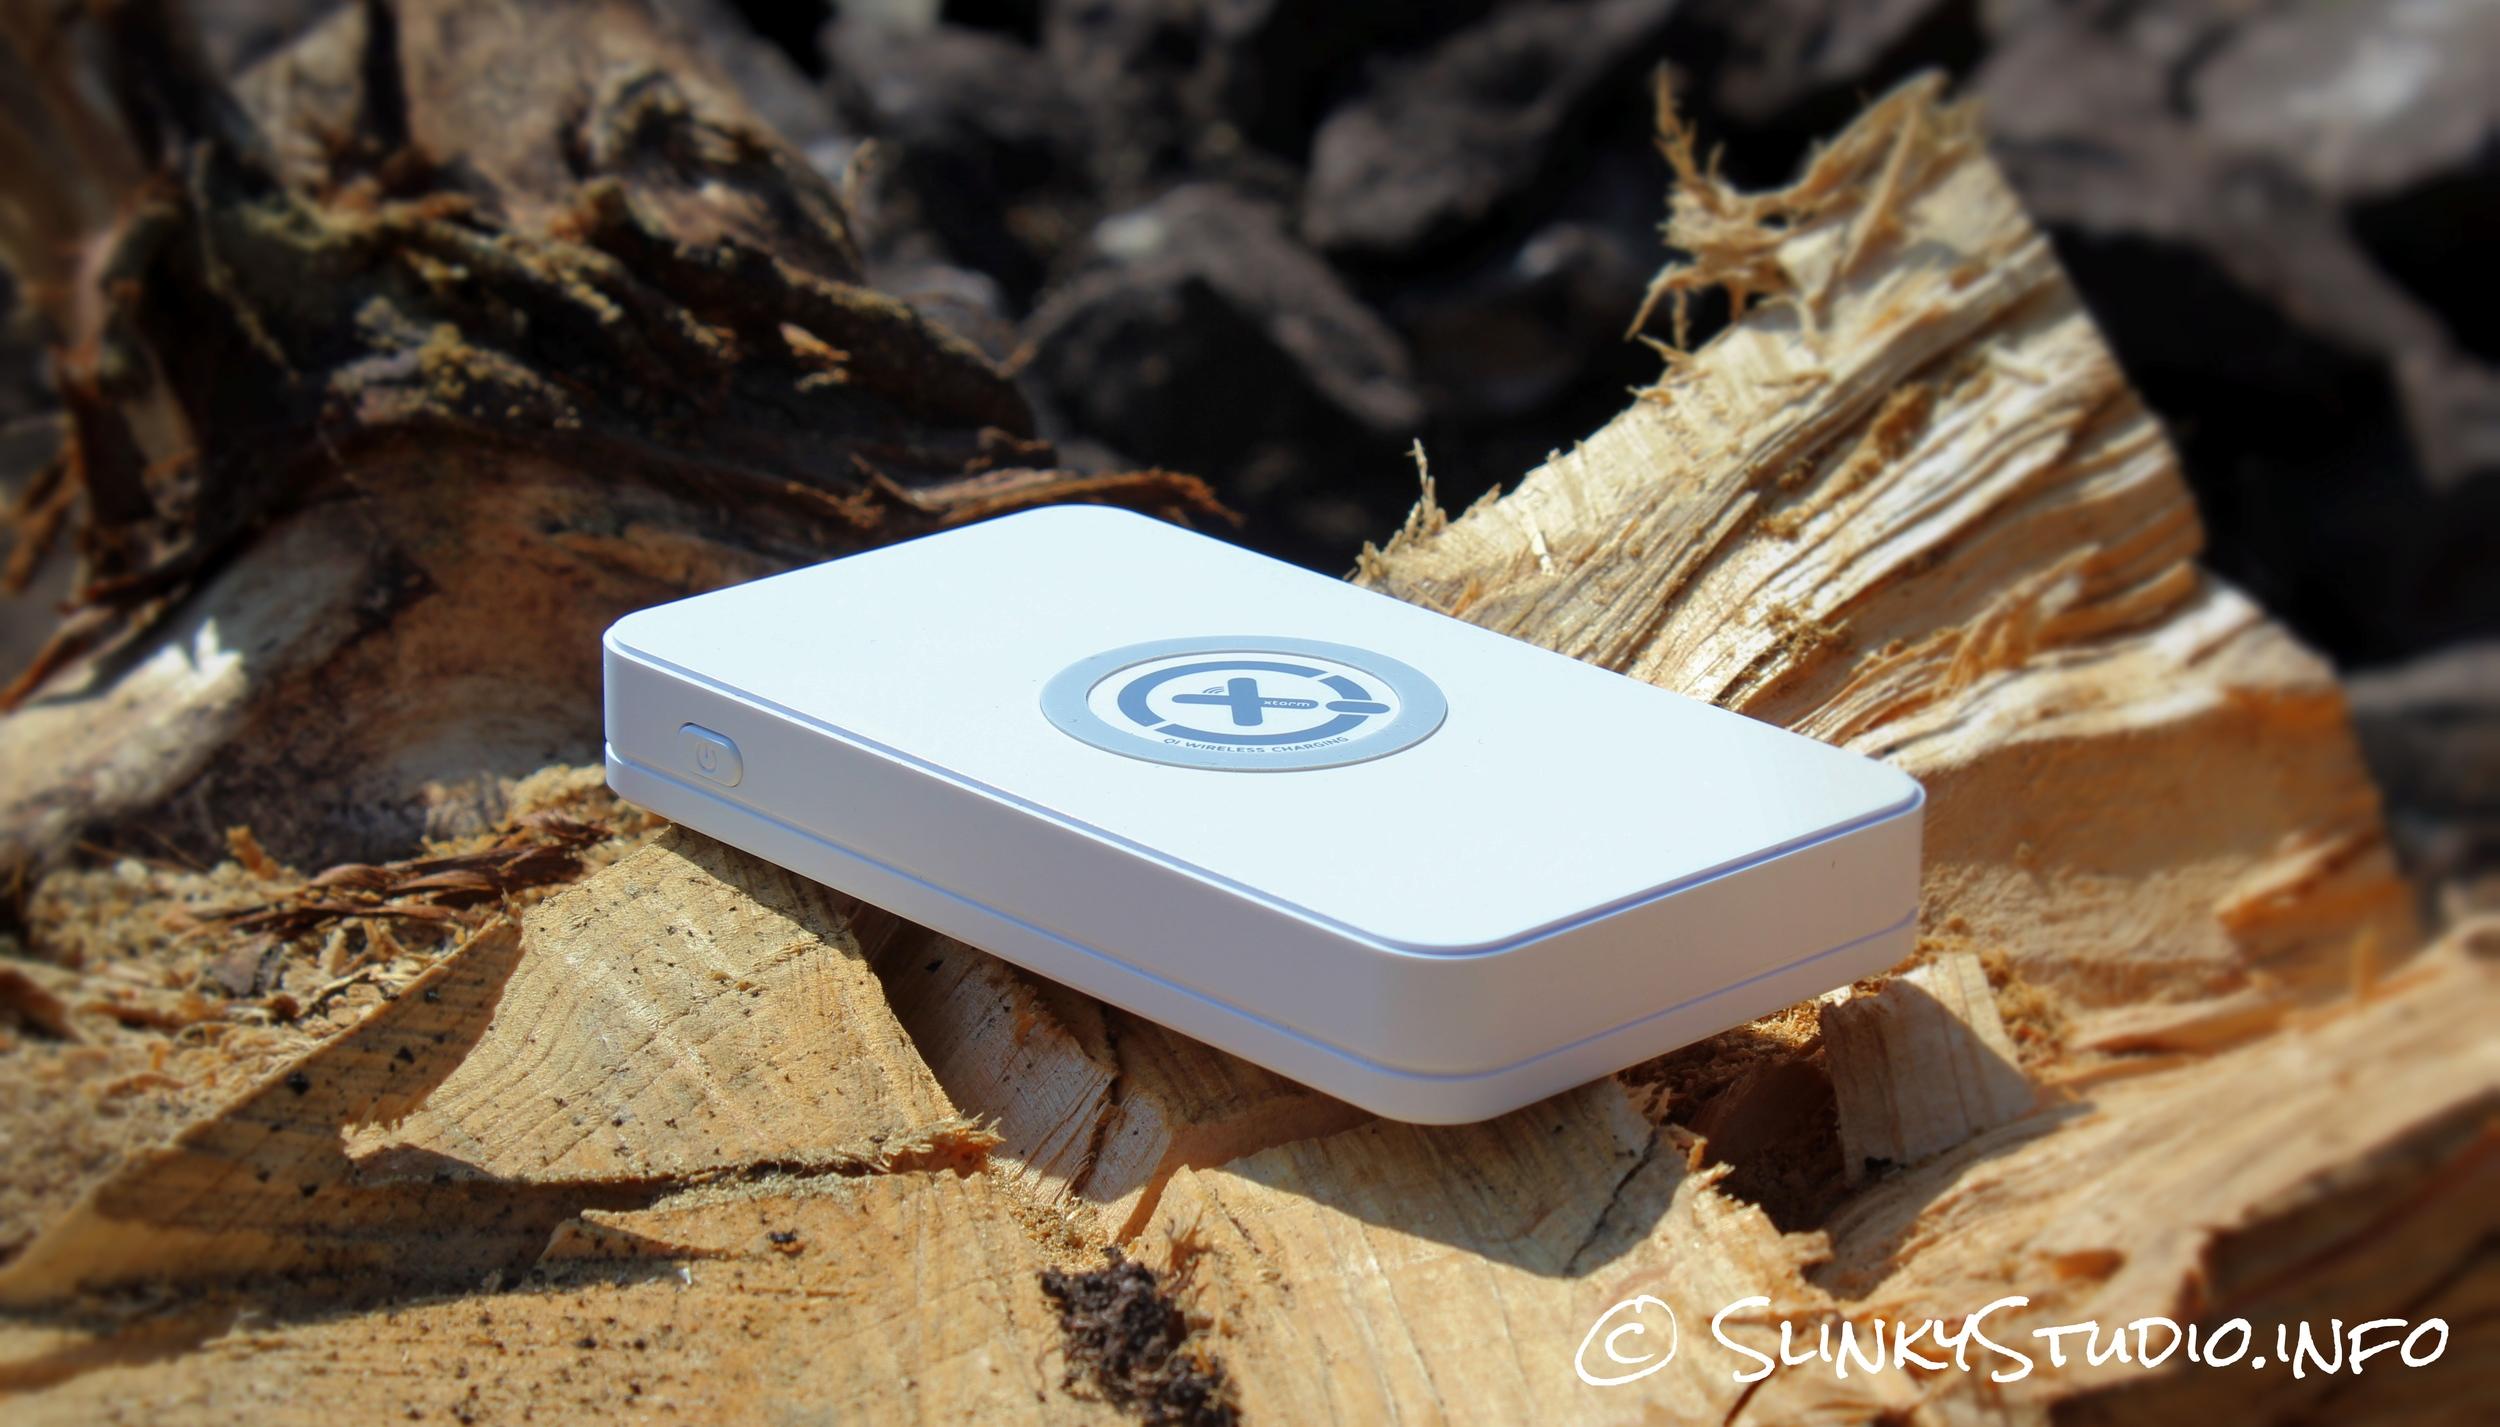 Xtorm Wireless Power Bank On Wood